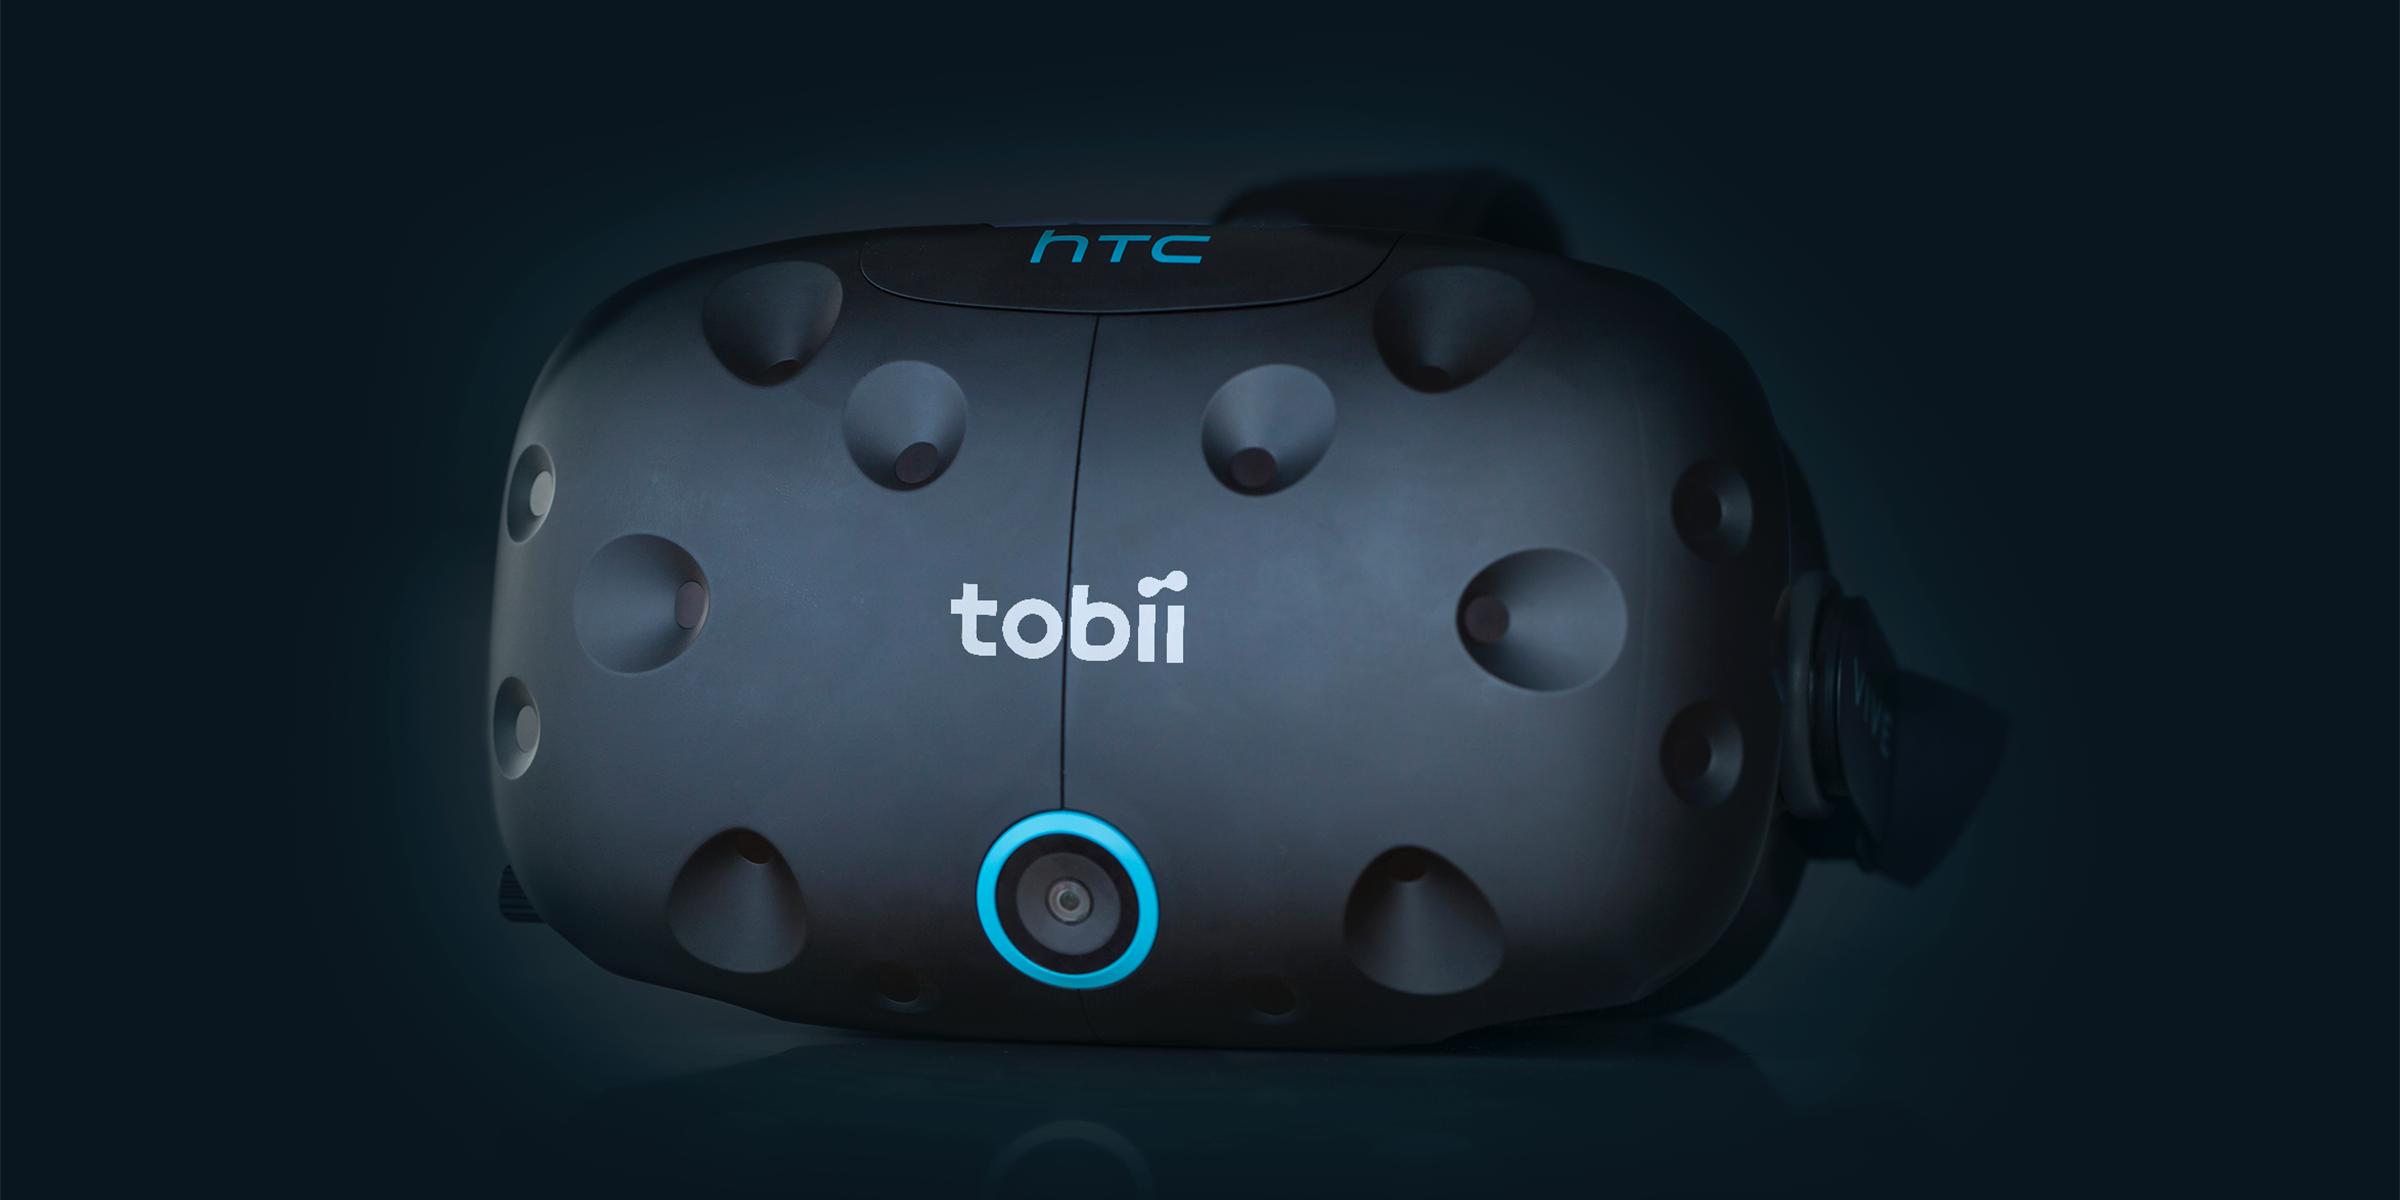 Tobii Releases Eye Tracking VR Development Kit for HTC Vive